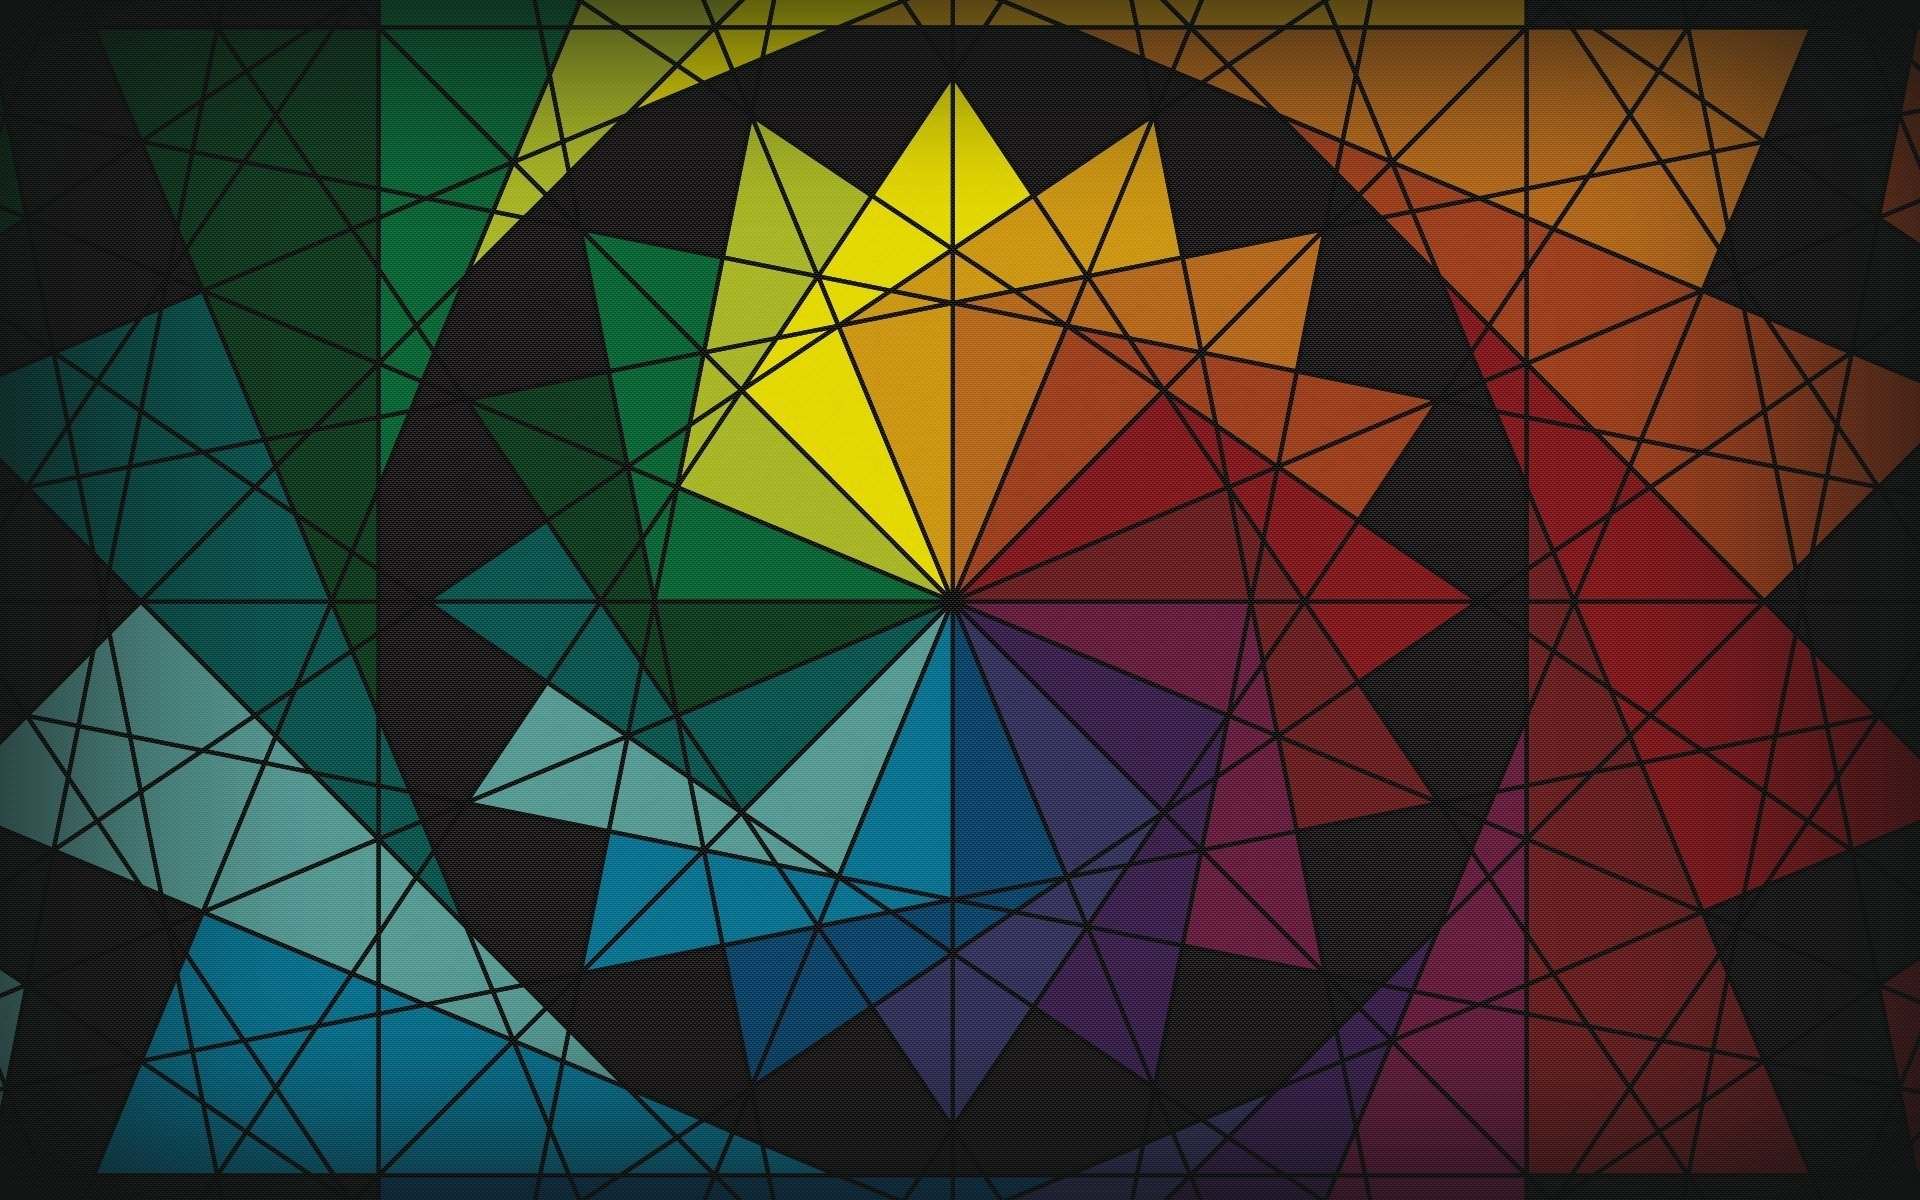 10 geometric art explorations for math learning - HD1920×1200